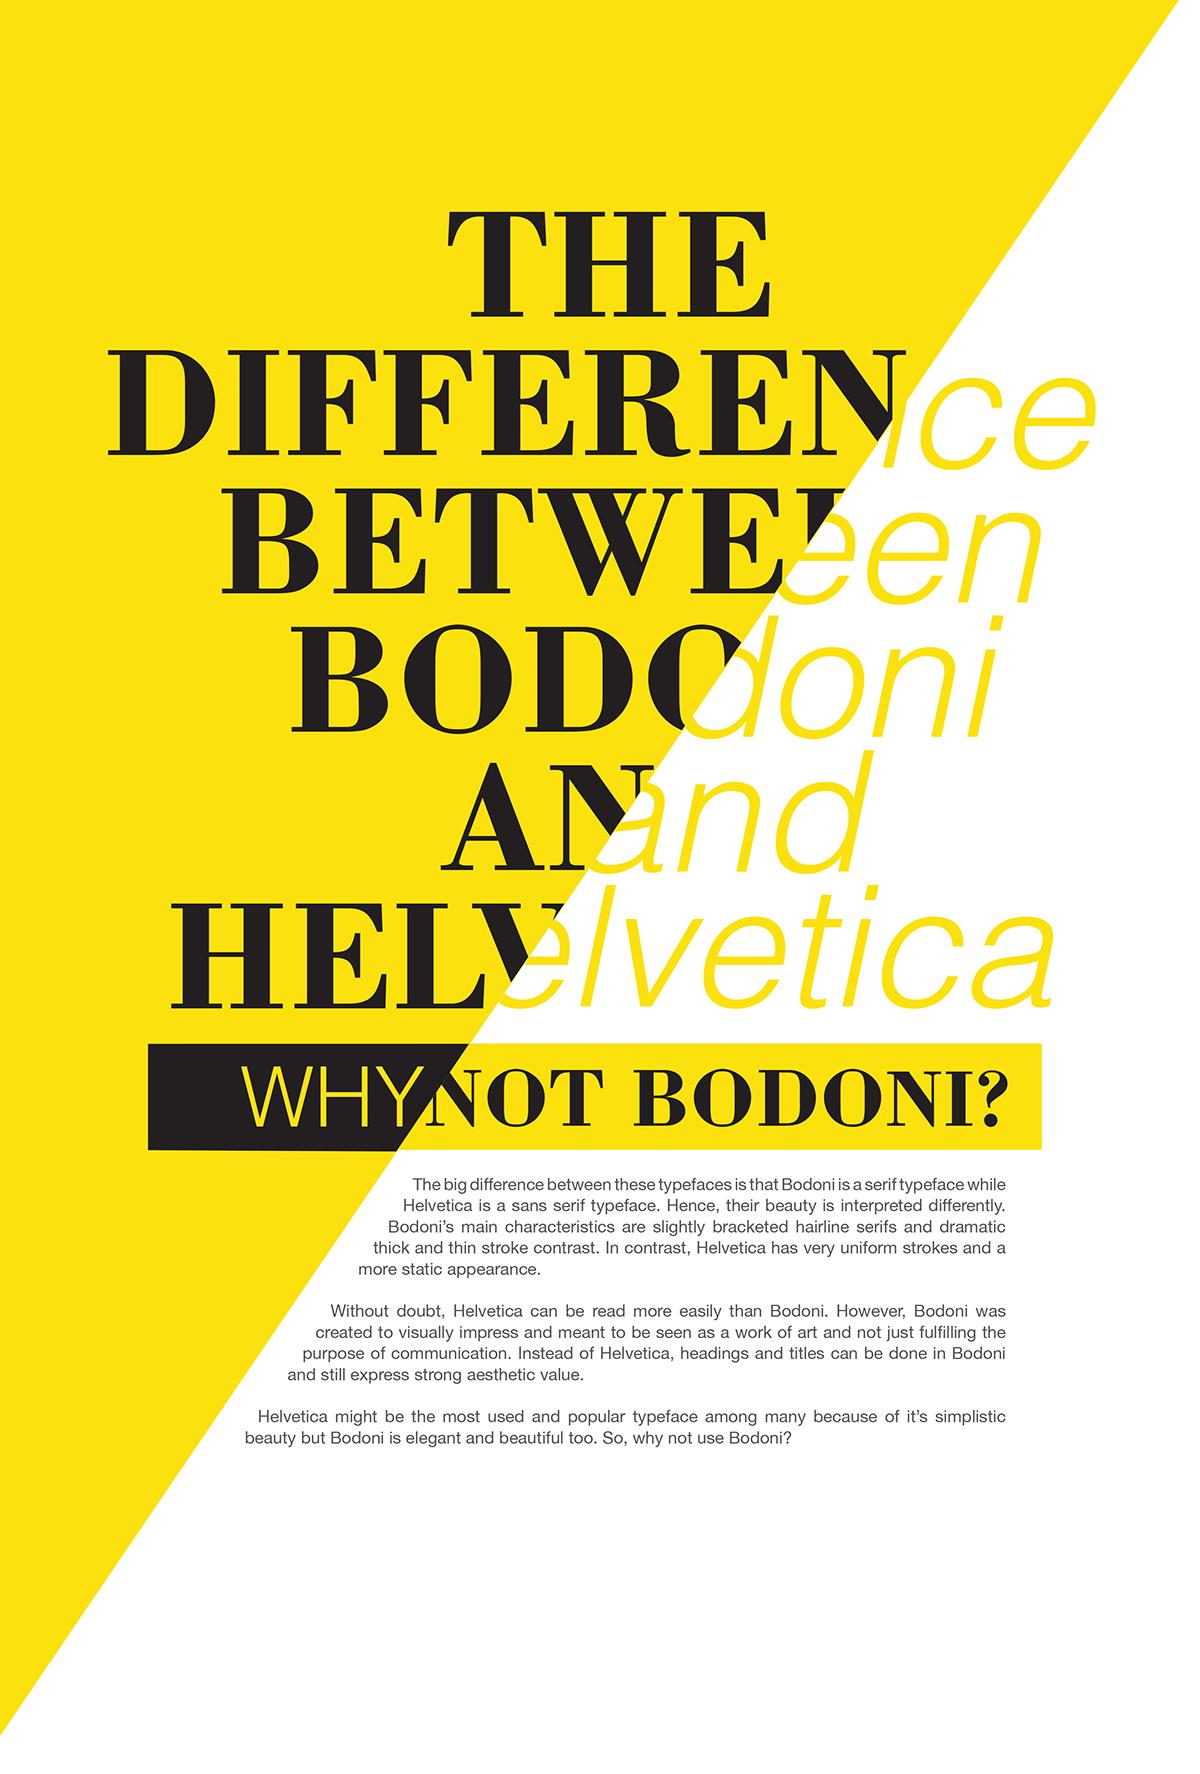 Bodoni Tribute on Behance